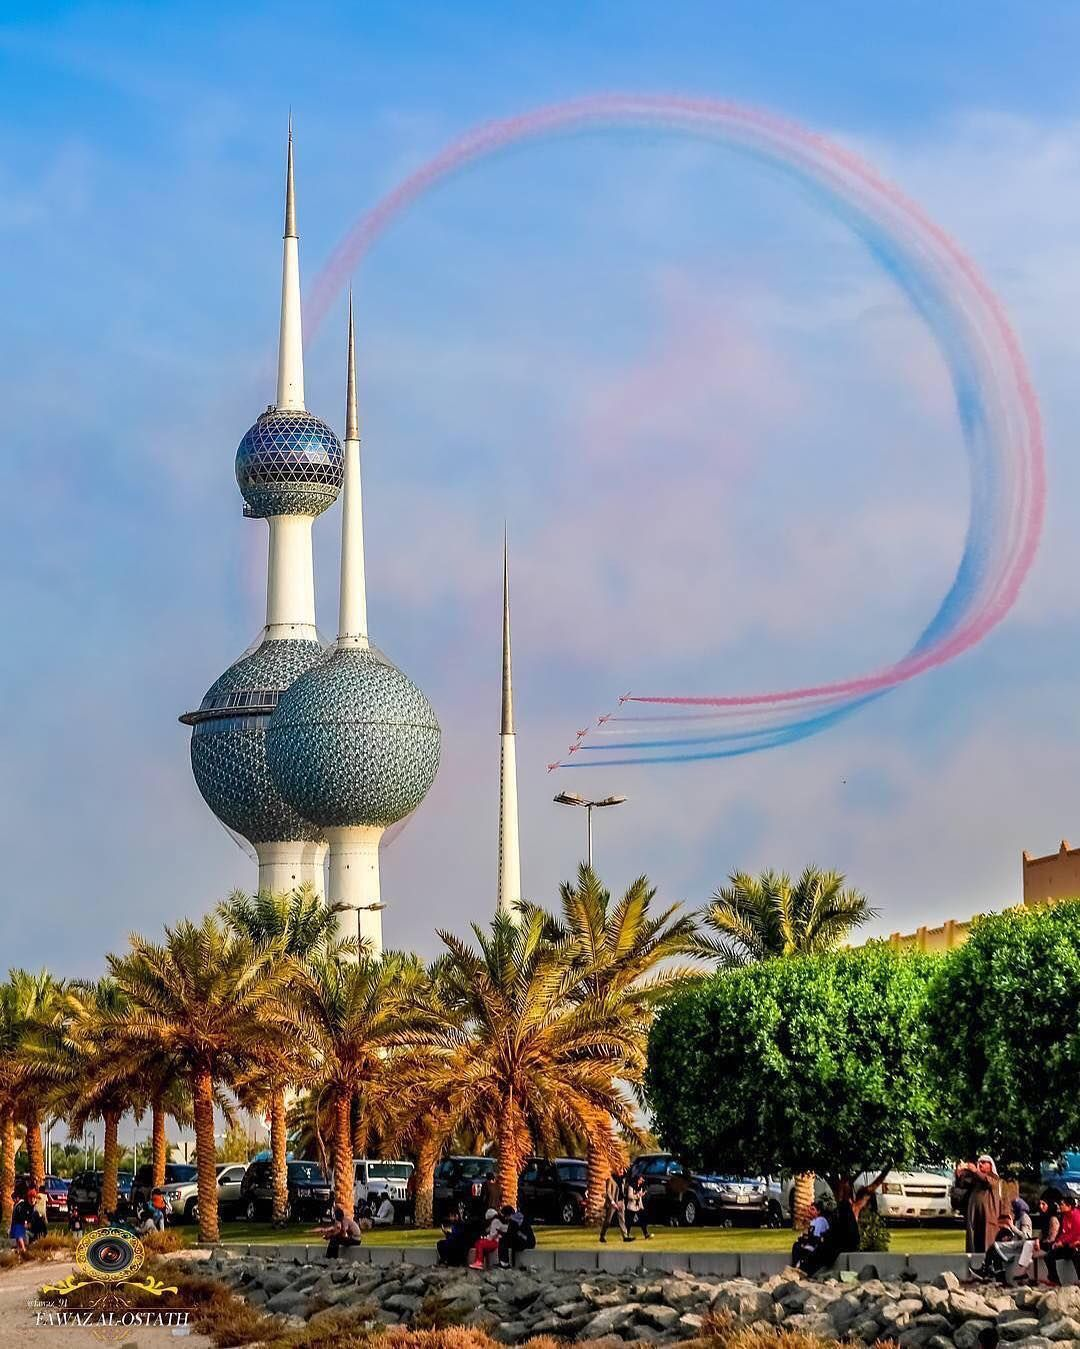 Kuwait Towers Is One Of Kuwait S Most Famous Landmarks أبراج الكويت ابراج الكويت Kuwait City Kuwait Kuwaitcity Middleeast Arabi Kuwait City Kuwait City